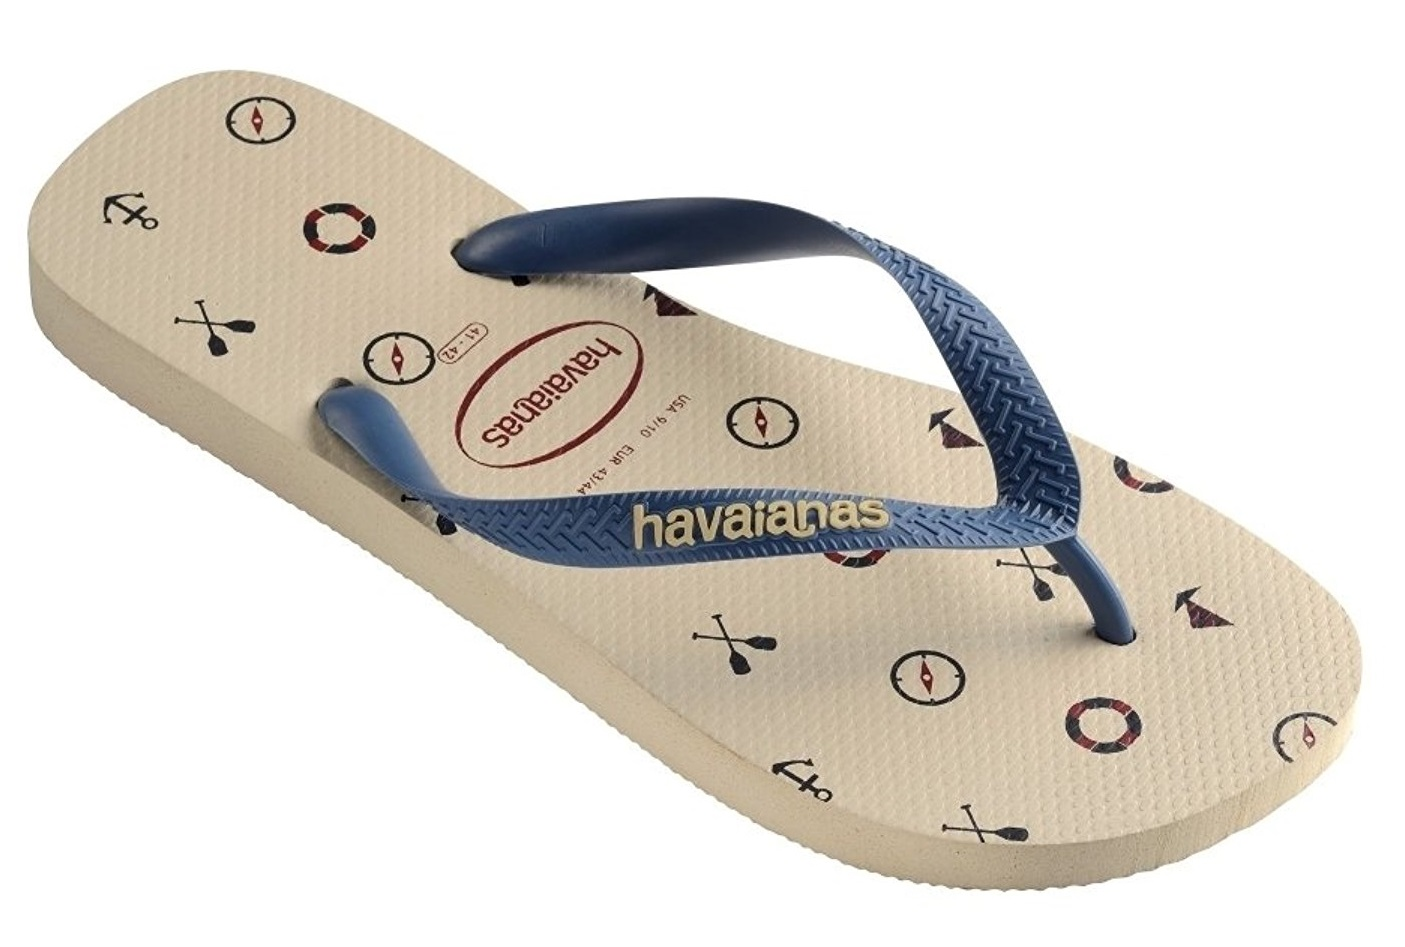 Havaianas Mens Top Nautical Flip-Flops Beige Sandals Size BR 37-38